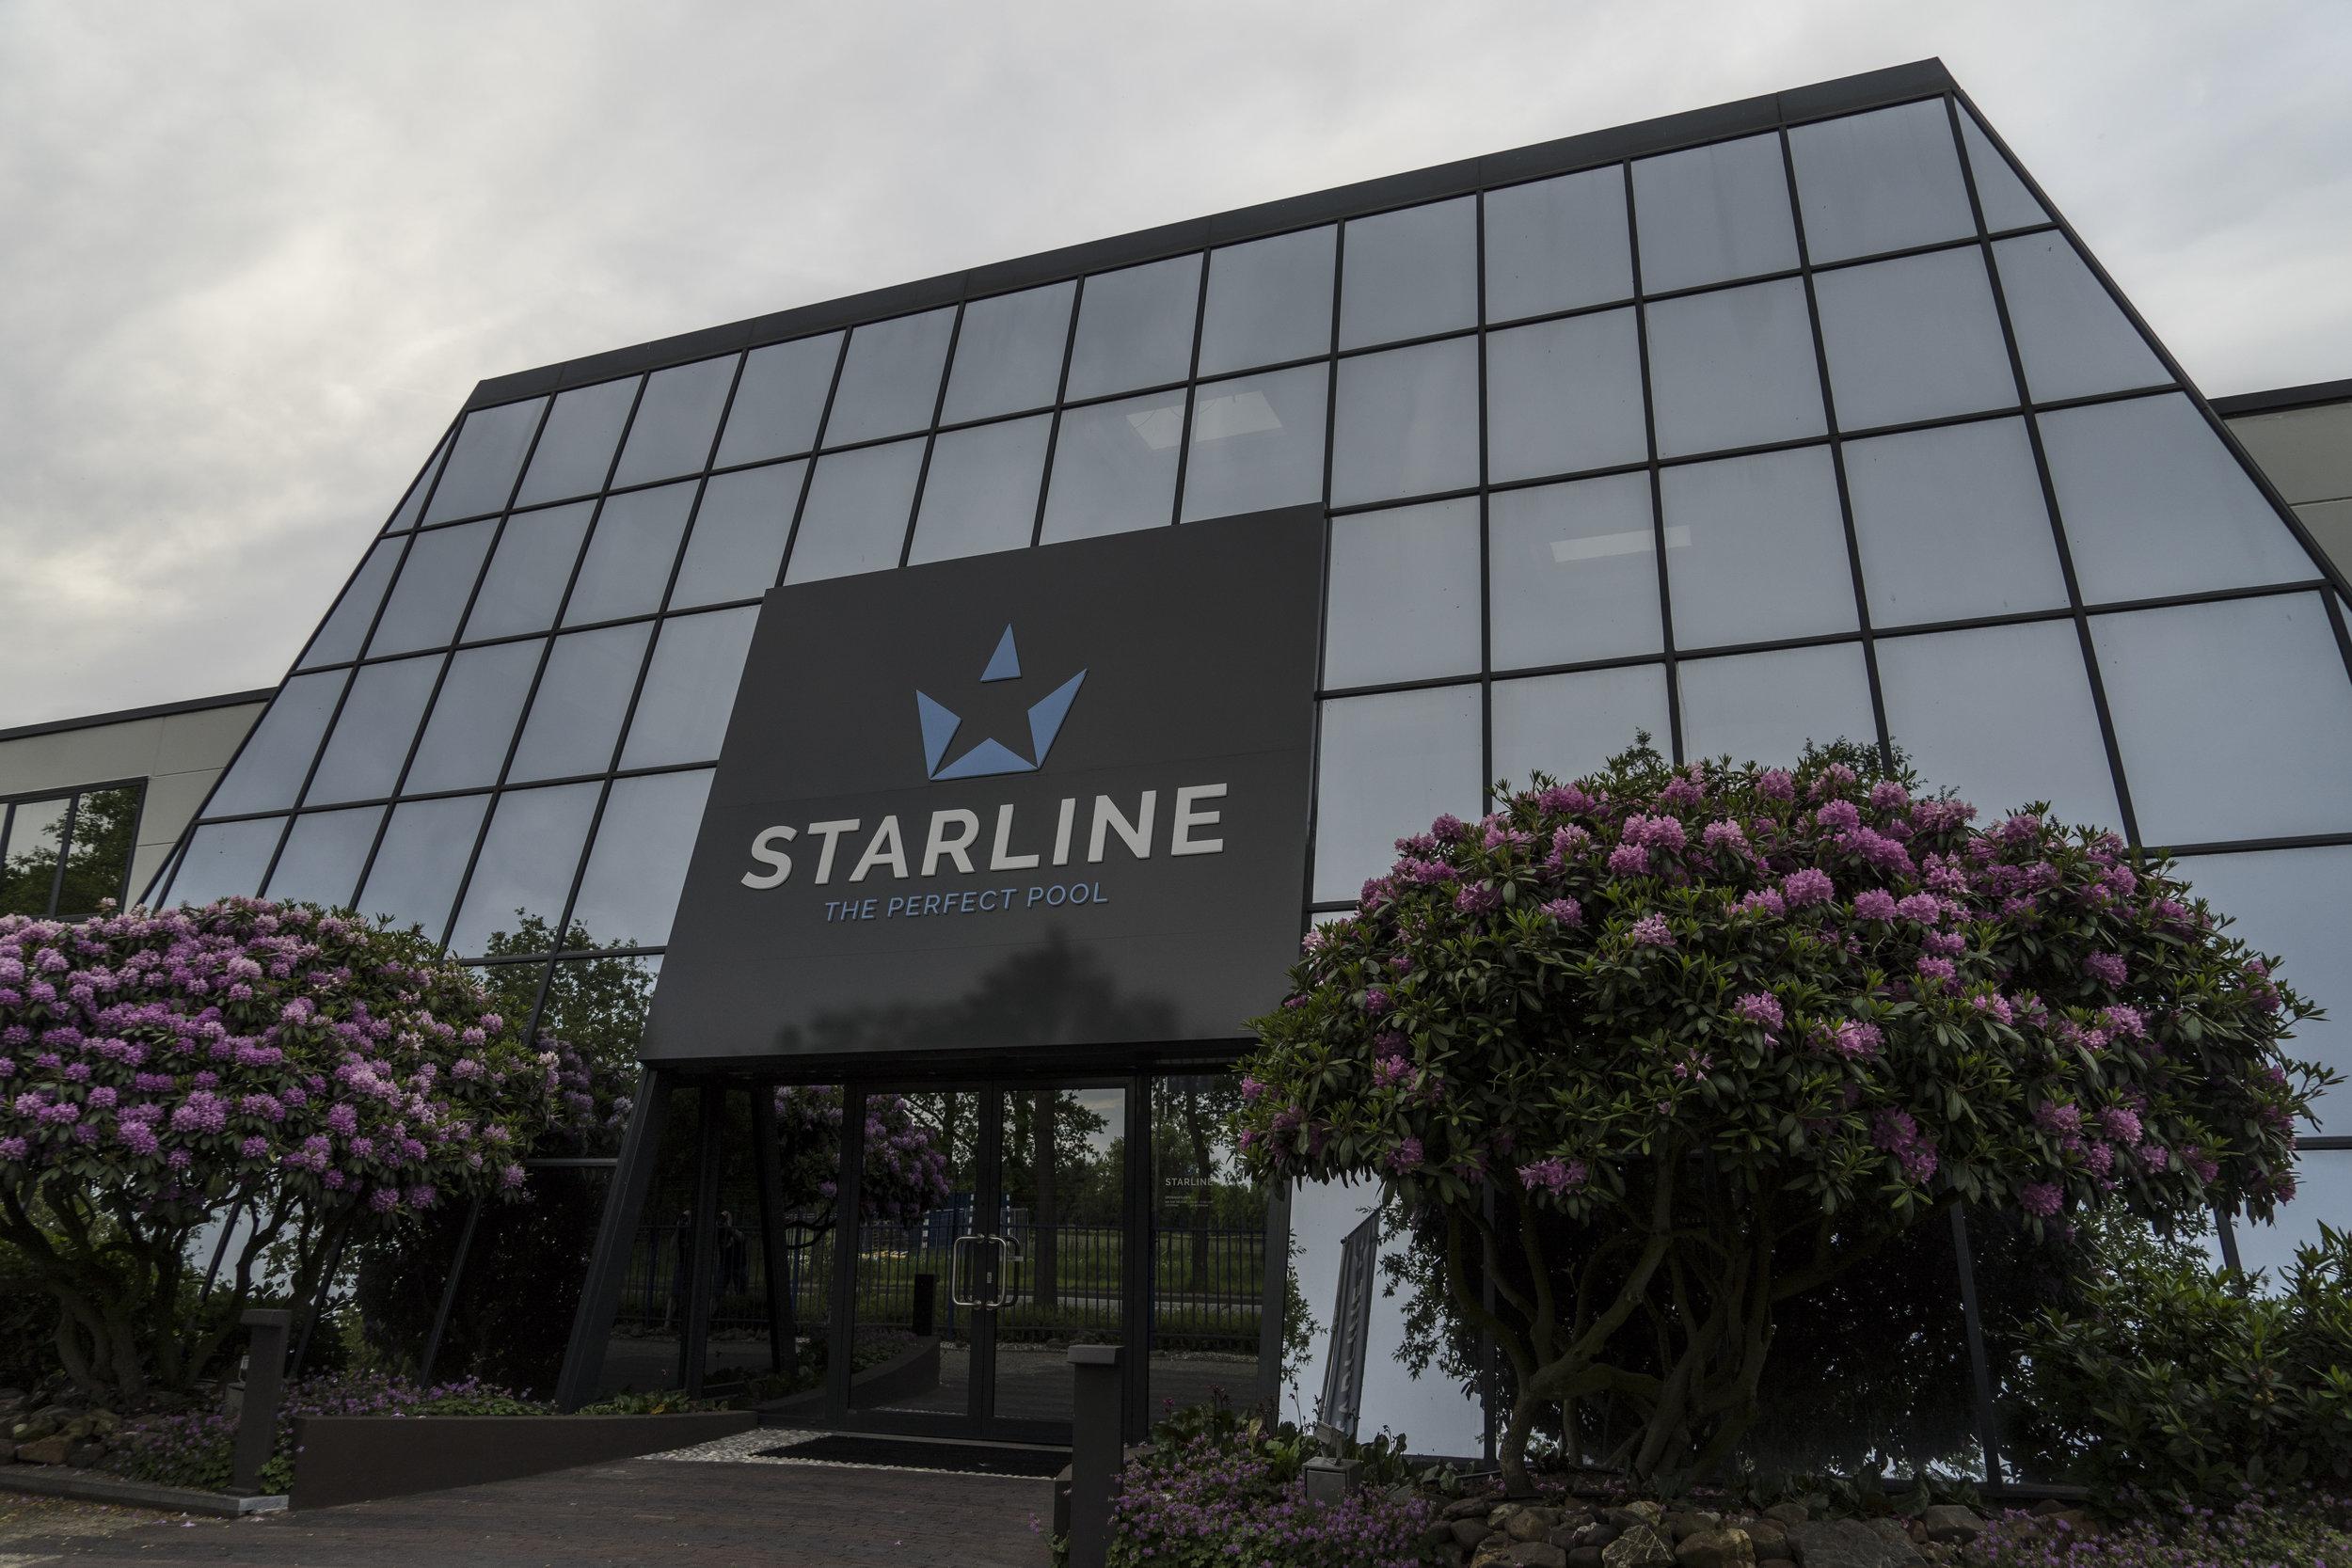 starline (2 van 2).jpg